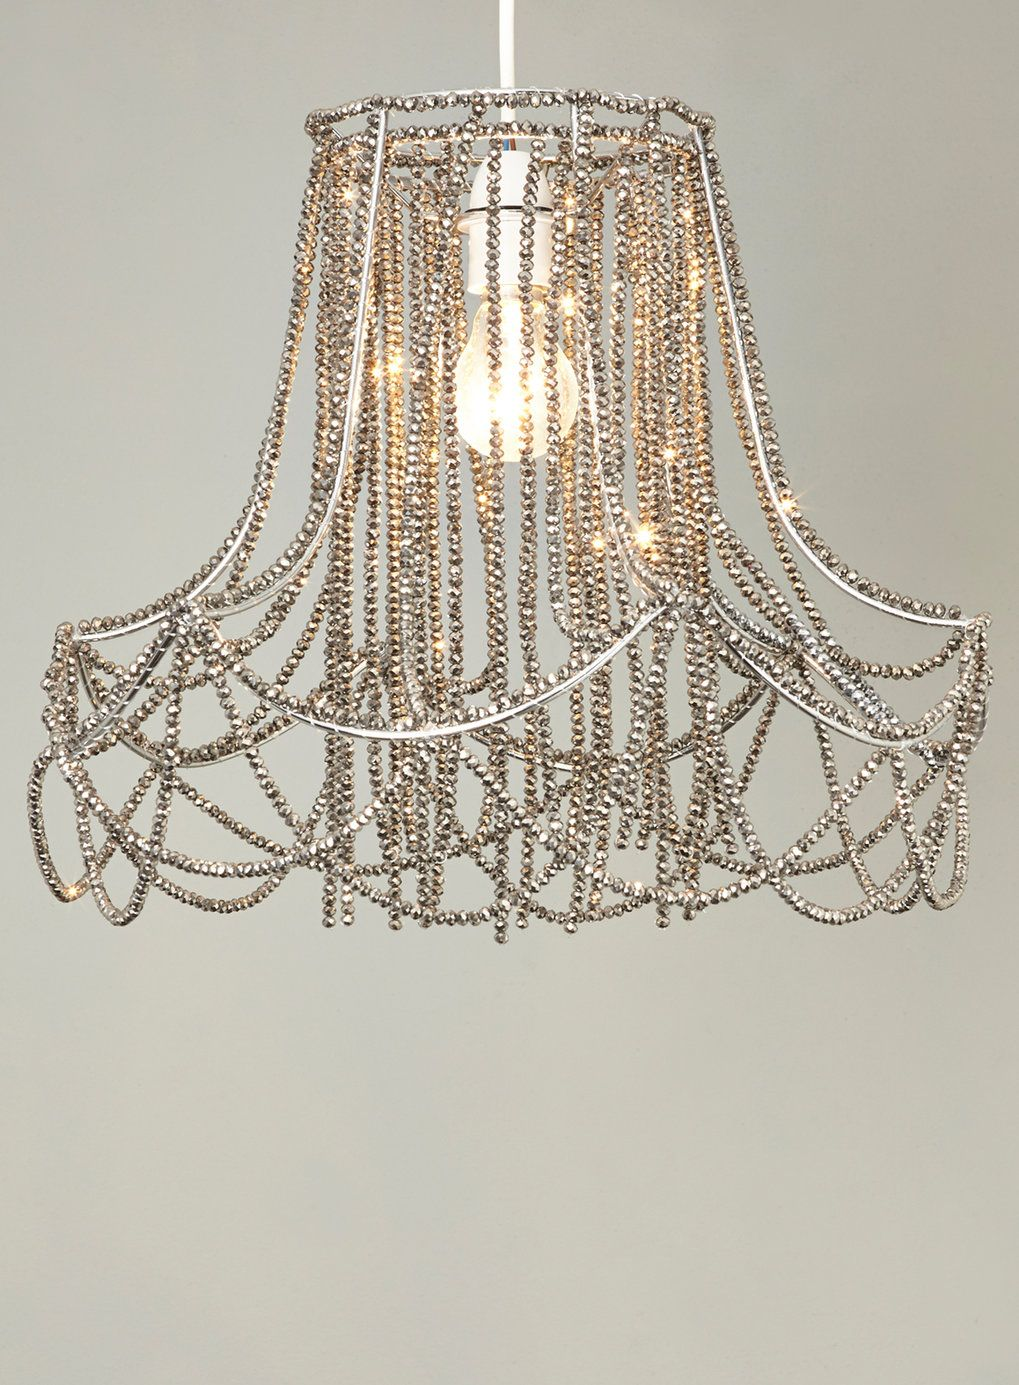 Bedroom Ceiling Lights Bhs : Lauren easyfit ceiling lights home lighting